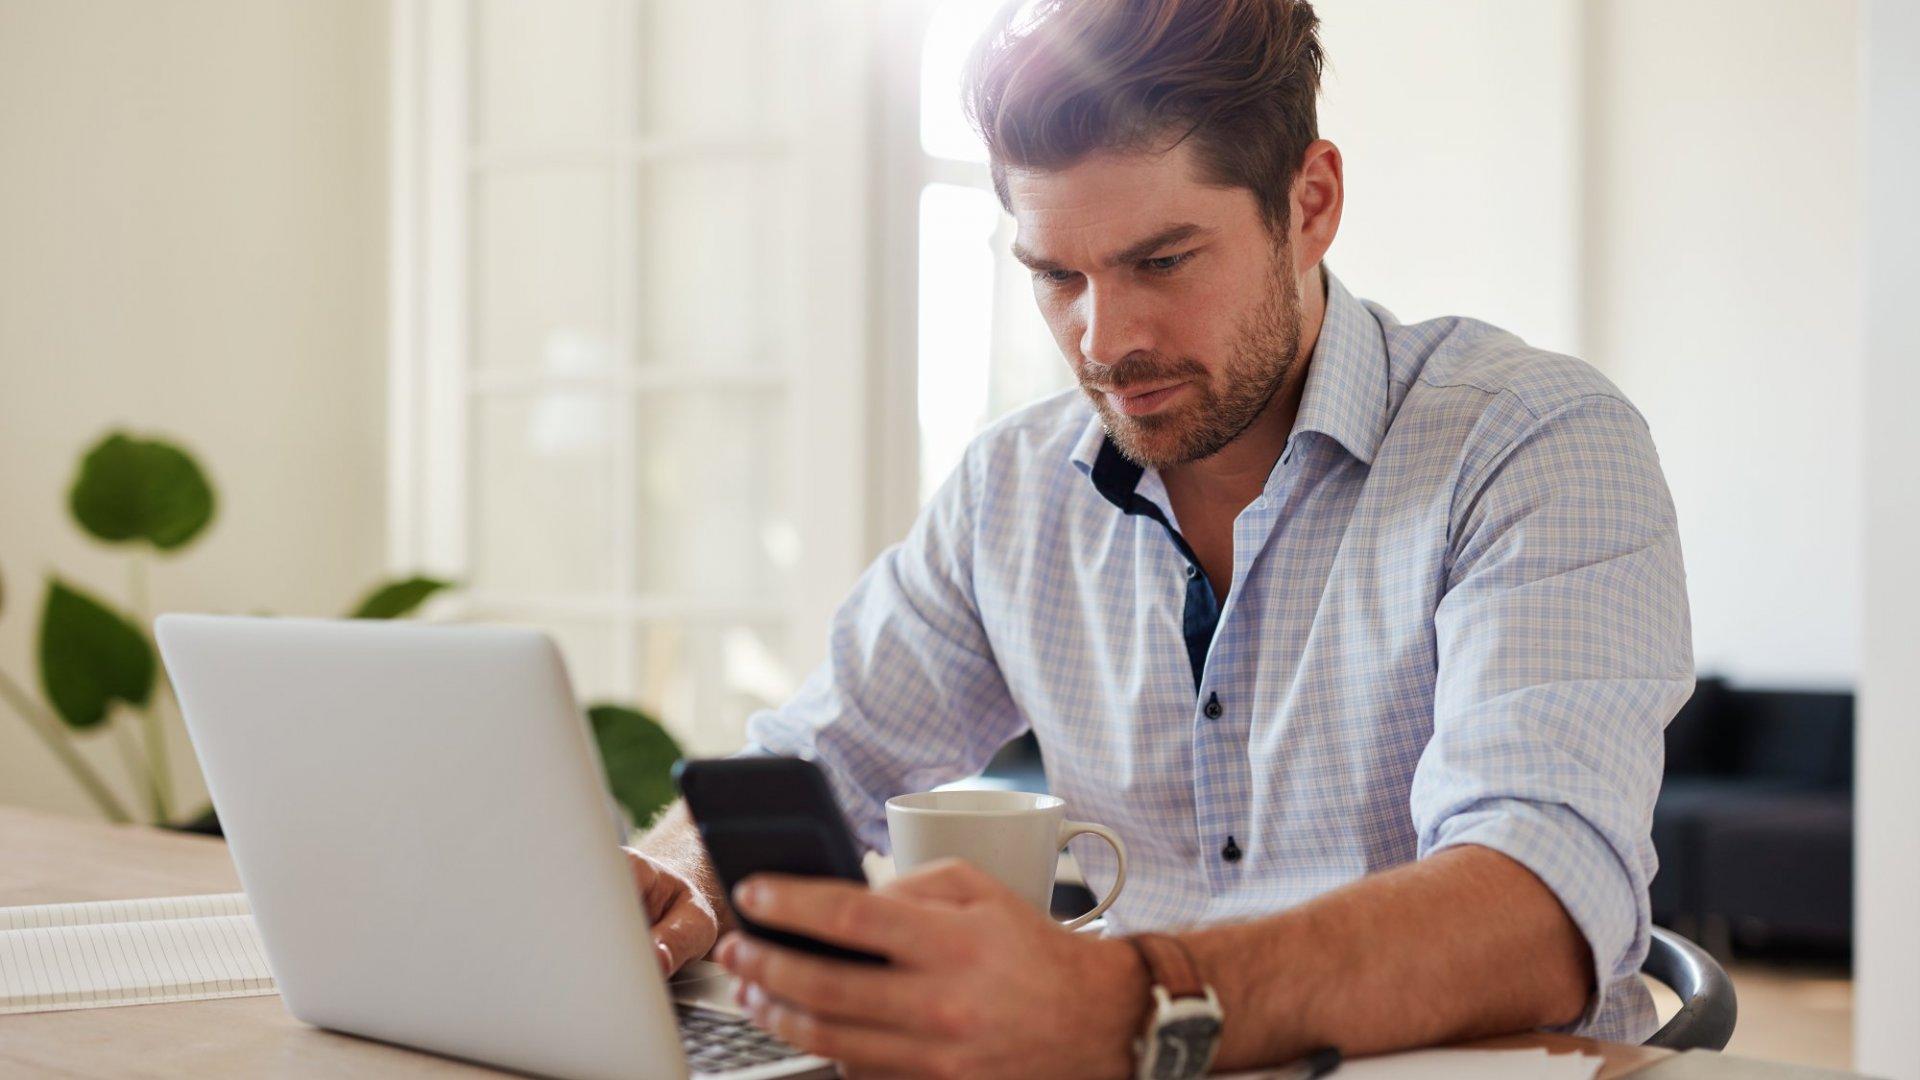 8 Steps for Entrepreneurs to Take Back their Time